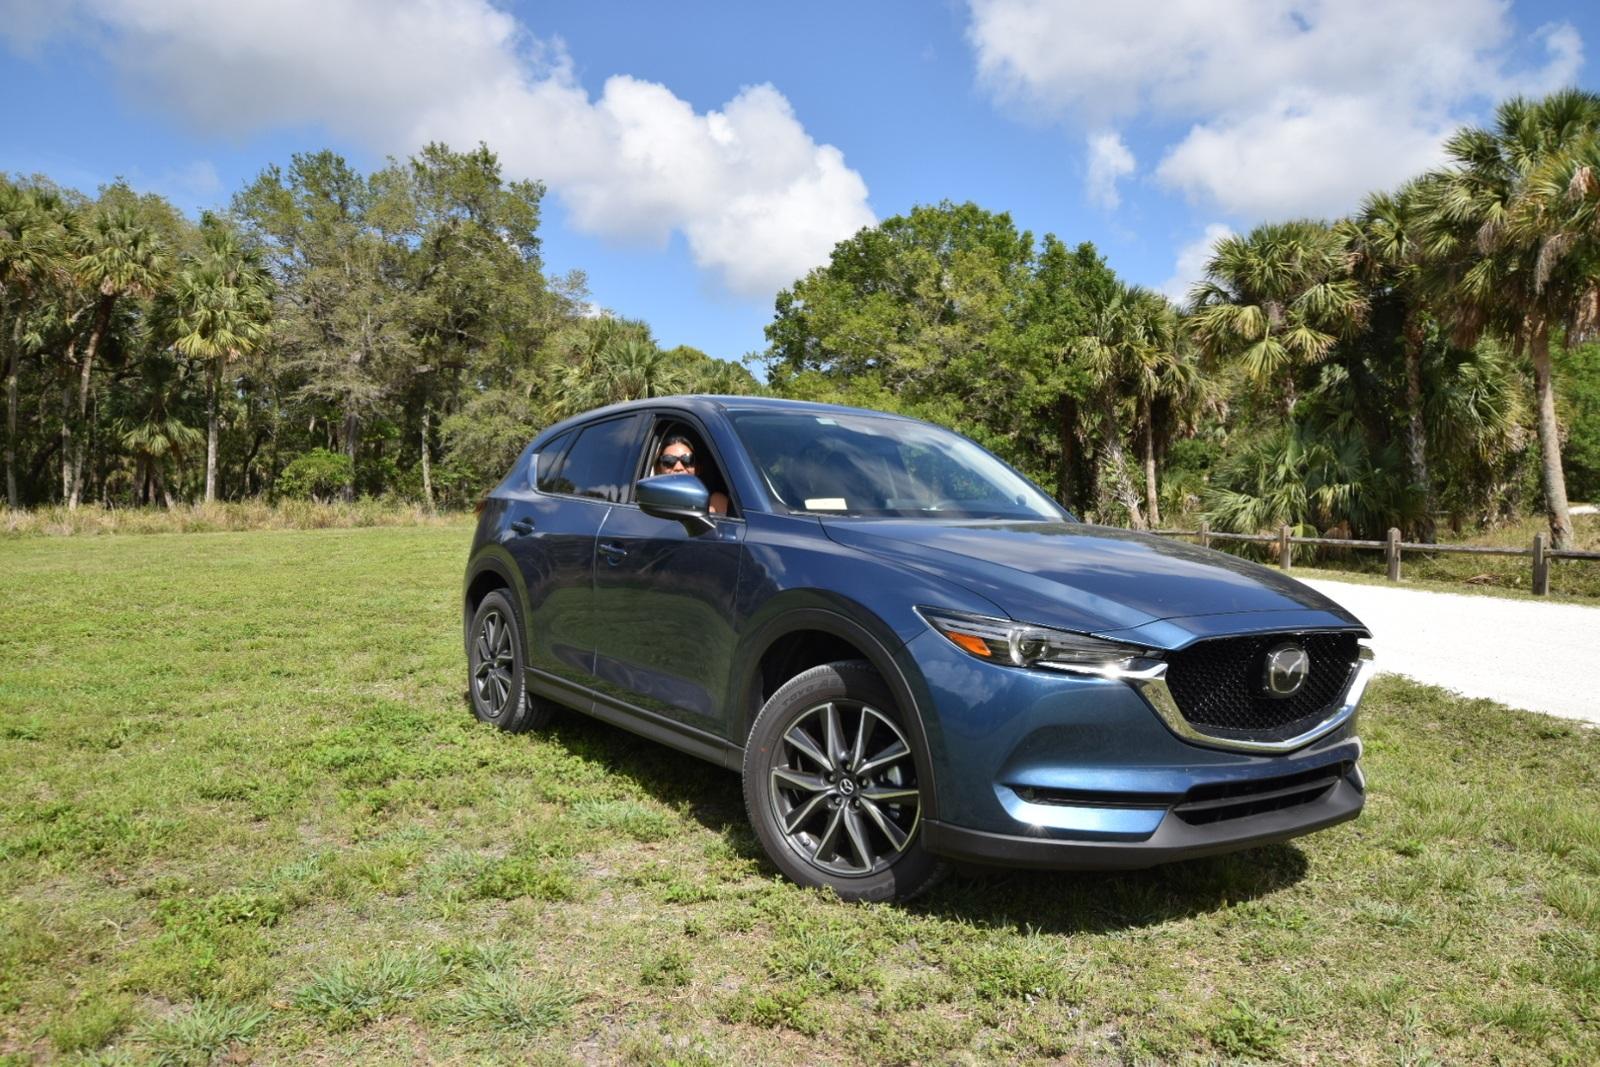 Kekurangan Mazda 2017 Harga